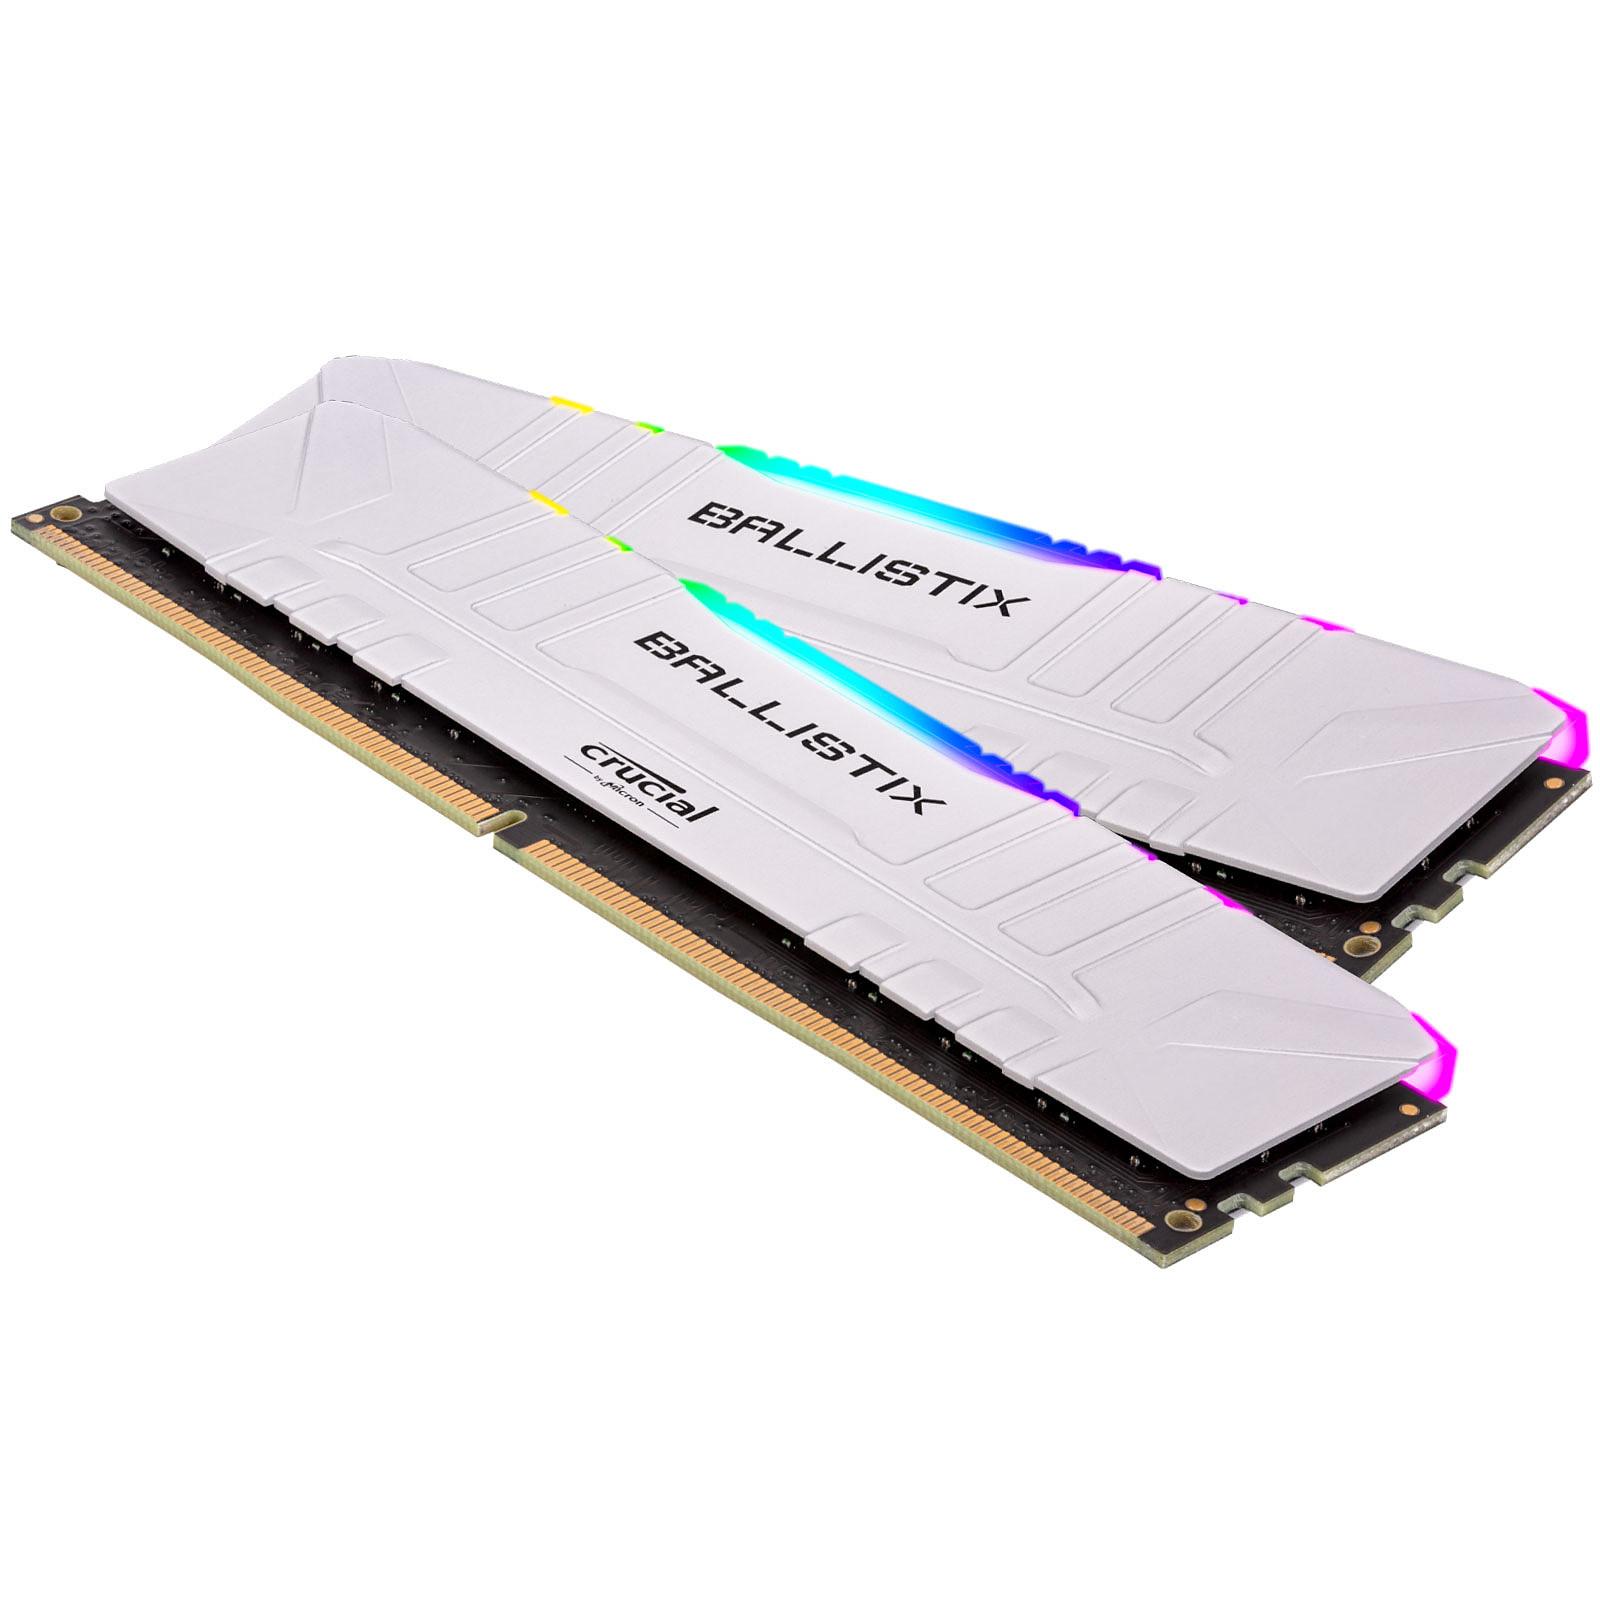 Ballistix White RGB DDR4 16 GB (2 x 8 GB) 3200 MHz CL16